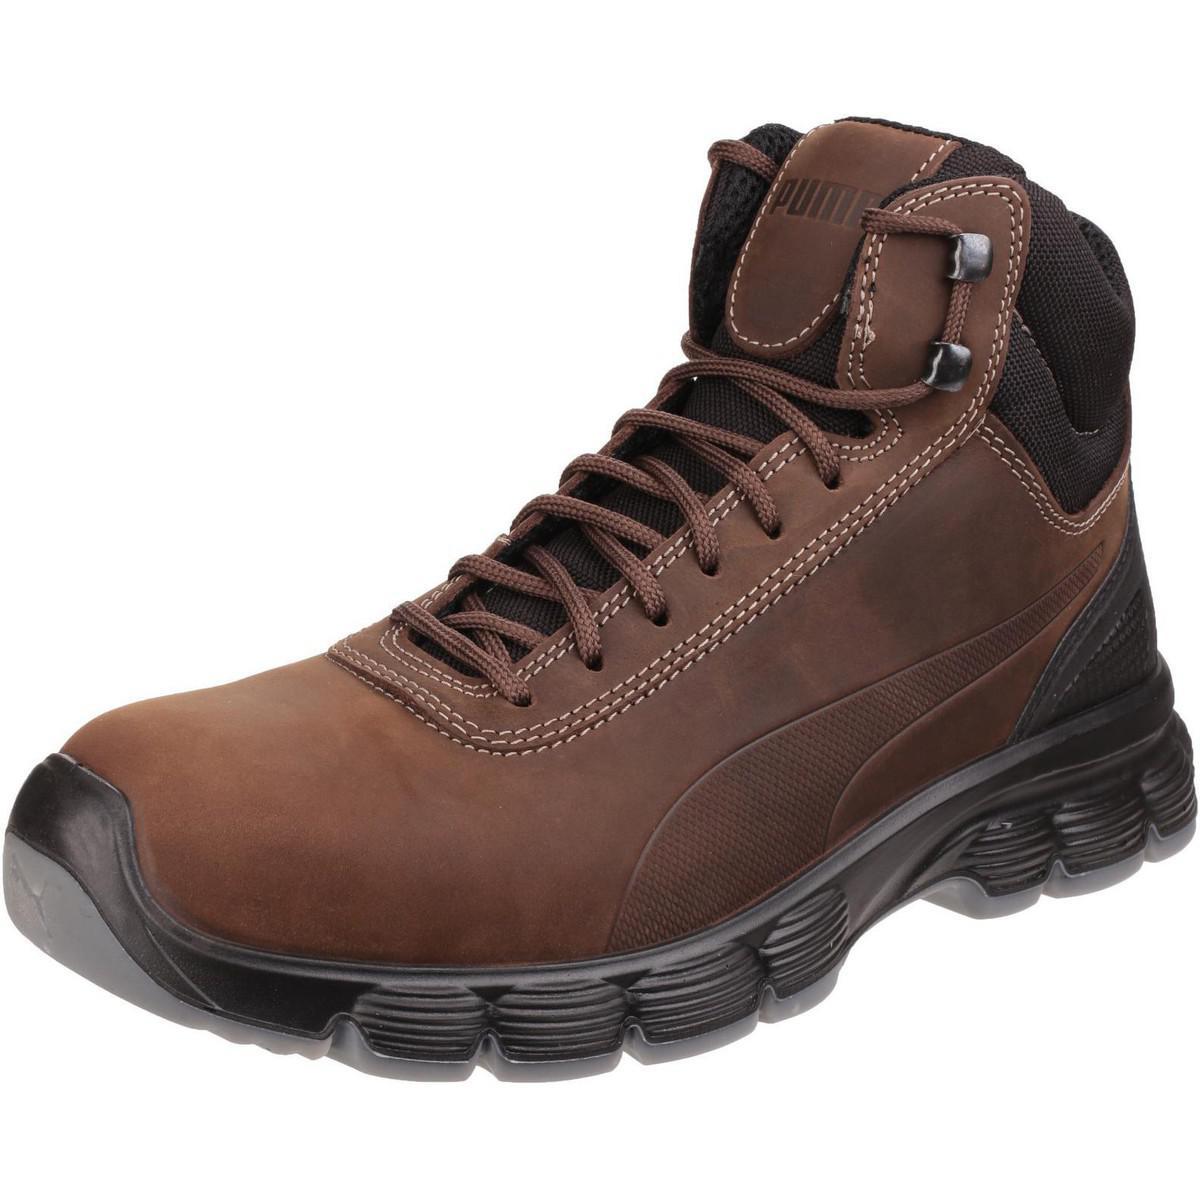 fe91b9ac1d3 Puma Condor Mid Men s Walking Boots In Brown in Brown for Men - Lyst